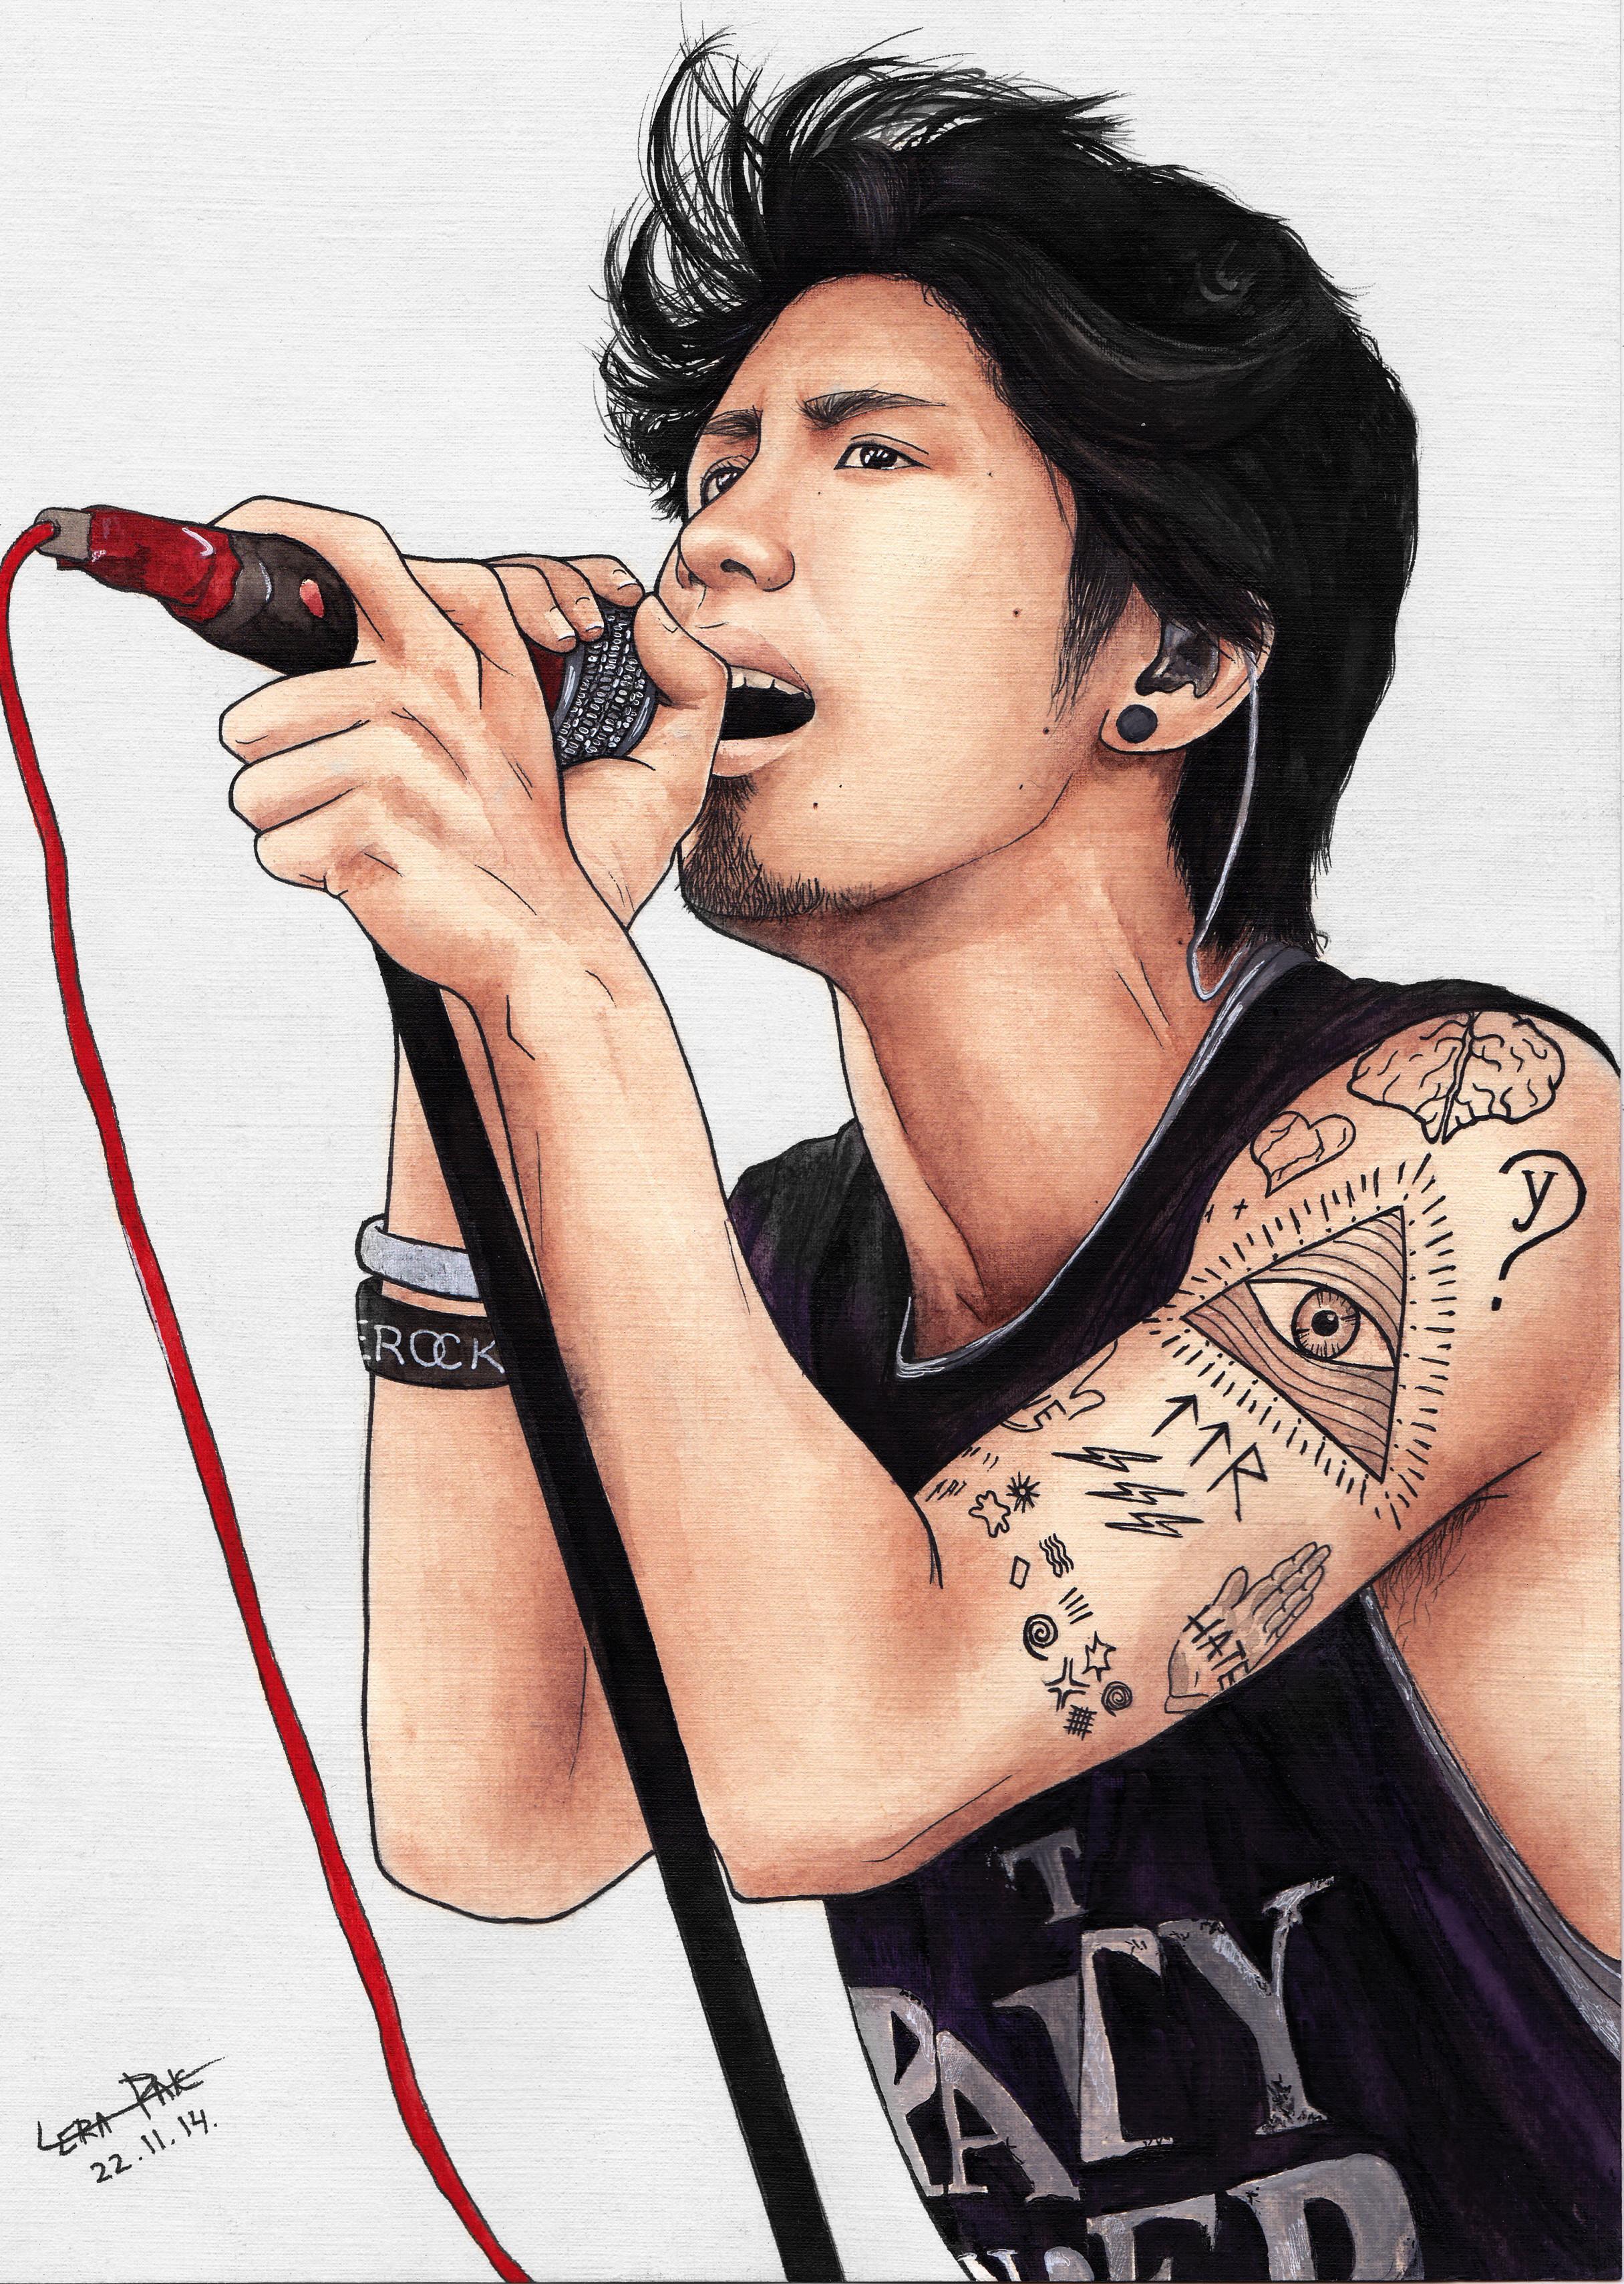 One Ok Rock Taka ボーカル 画像まとめ 100枚以上 壁紙 高画質